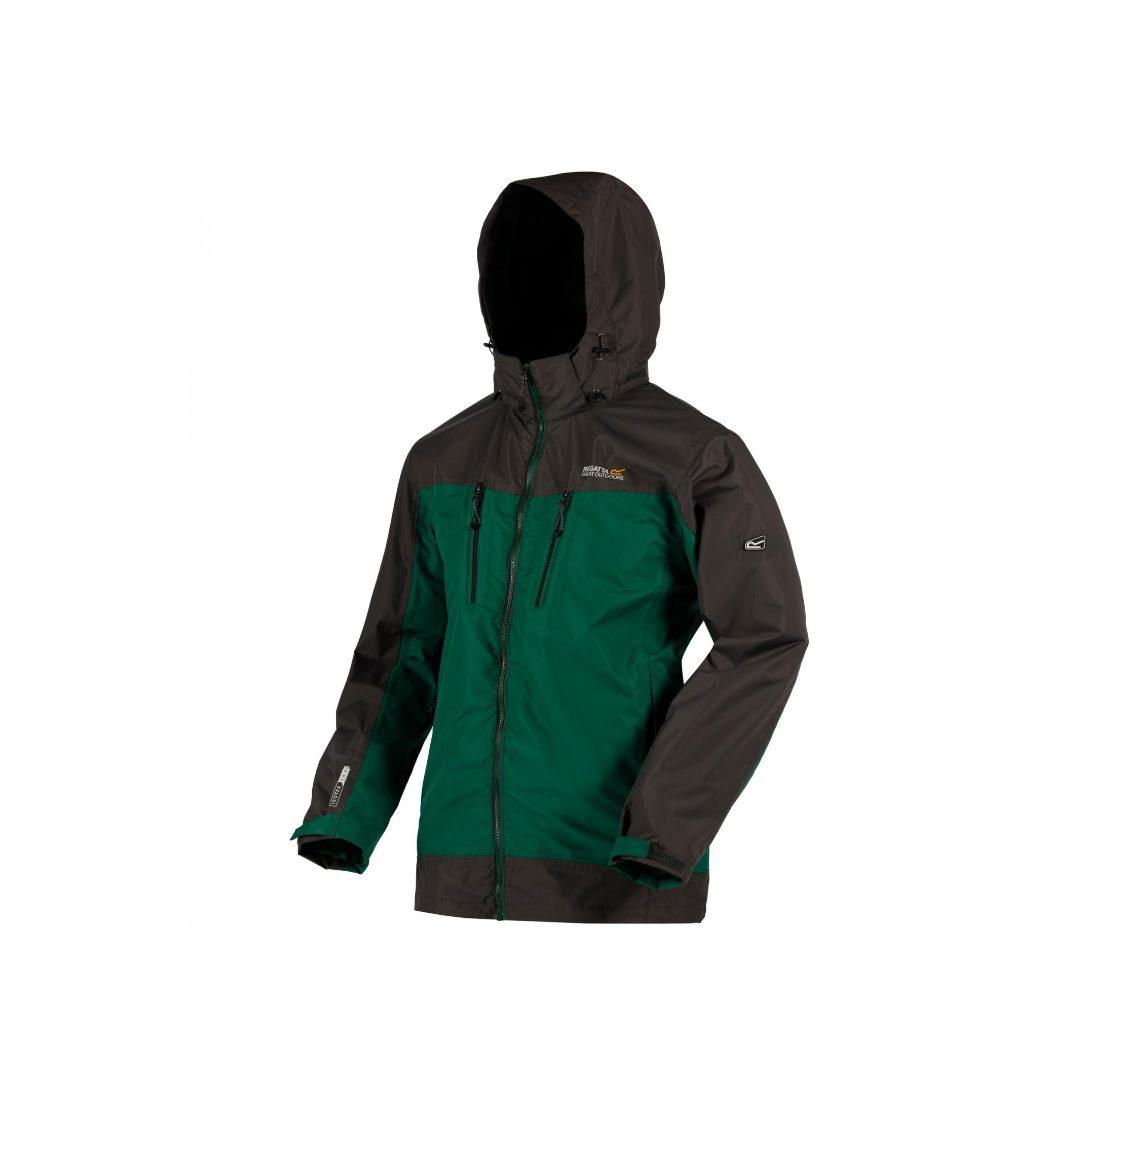 Regatta Mens Calderdale II jacket - green